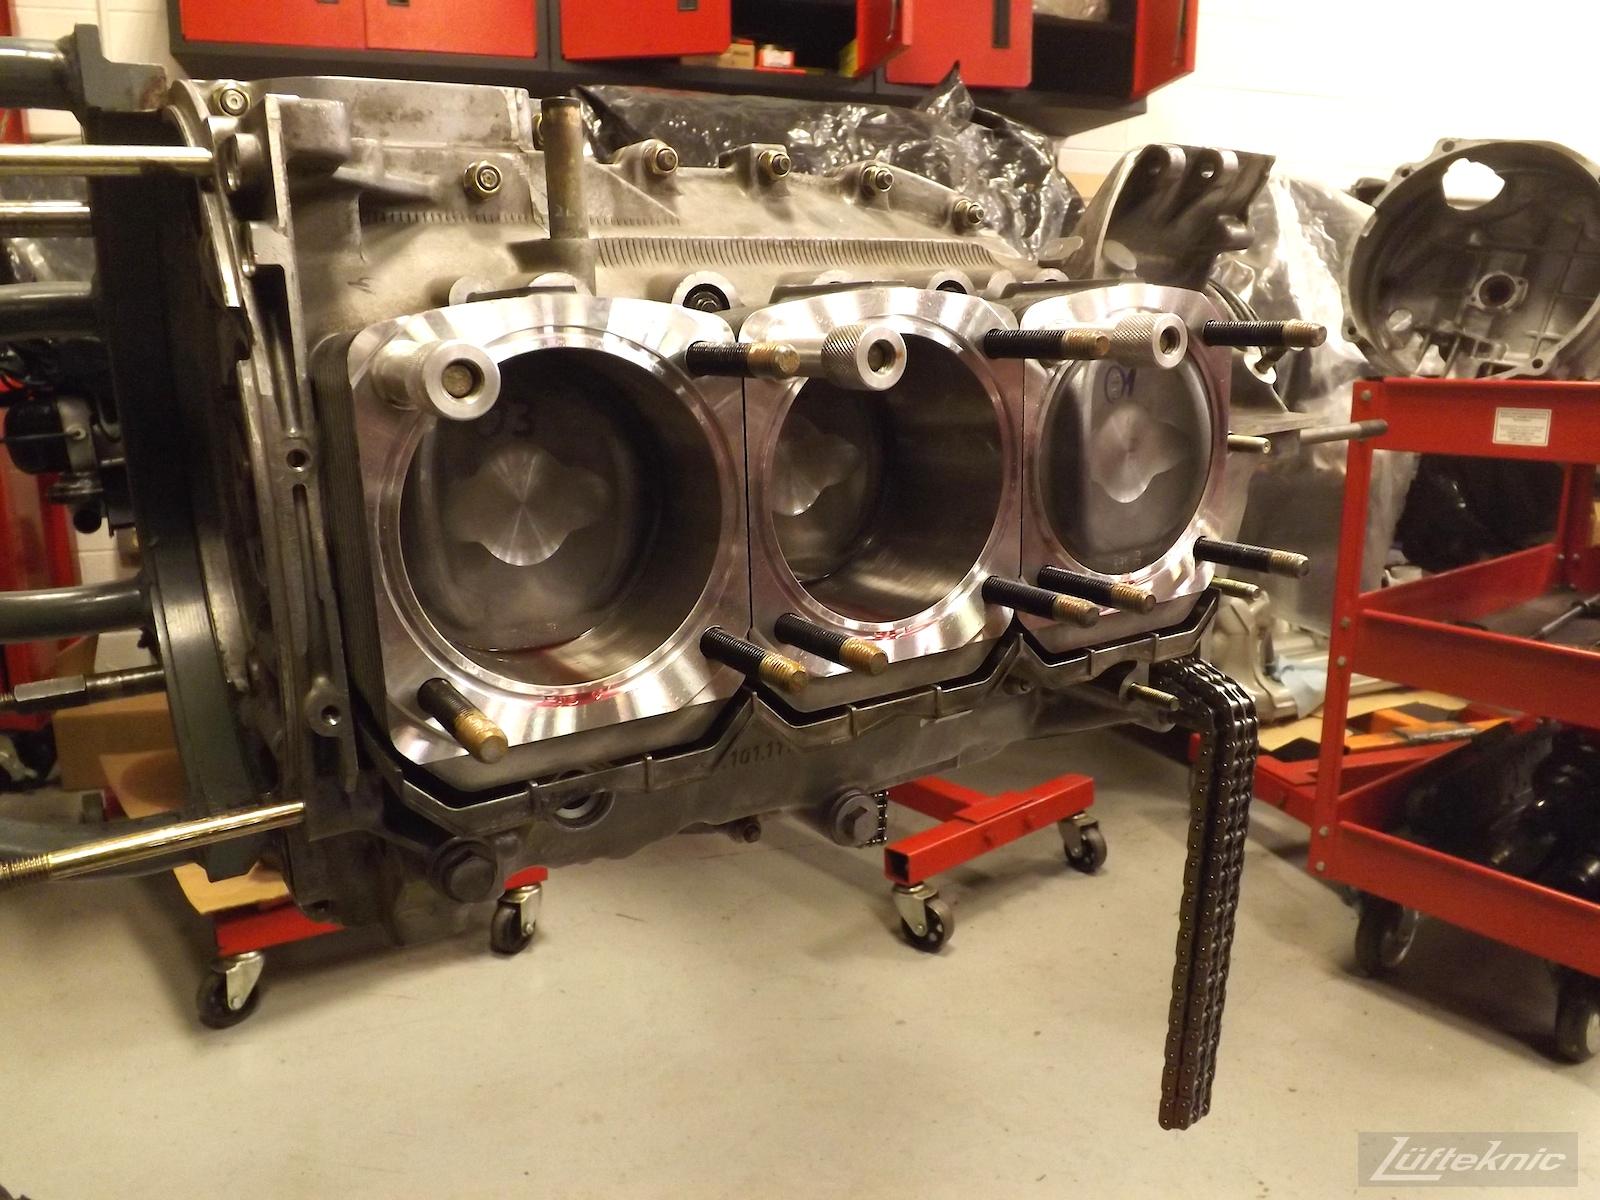 Freshly rebuilt 993 Turbo motor with pistons installed.